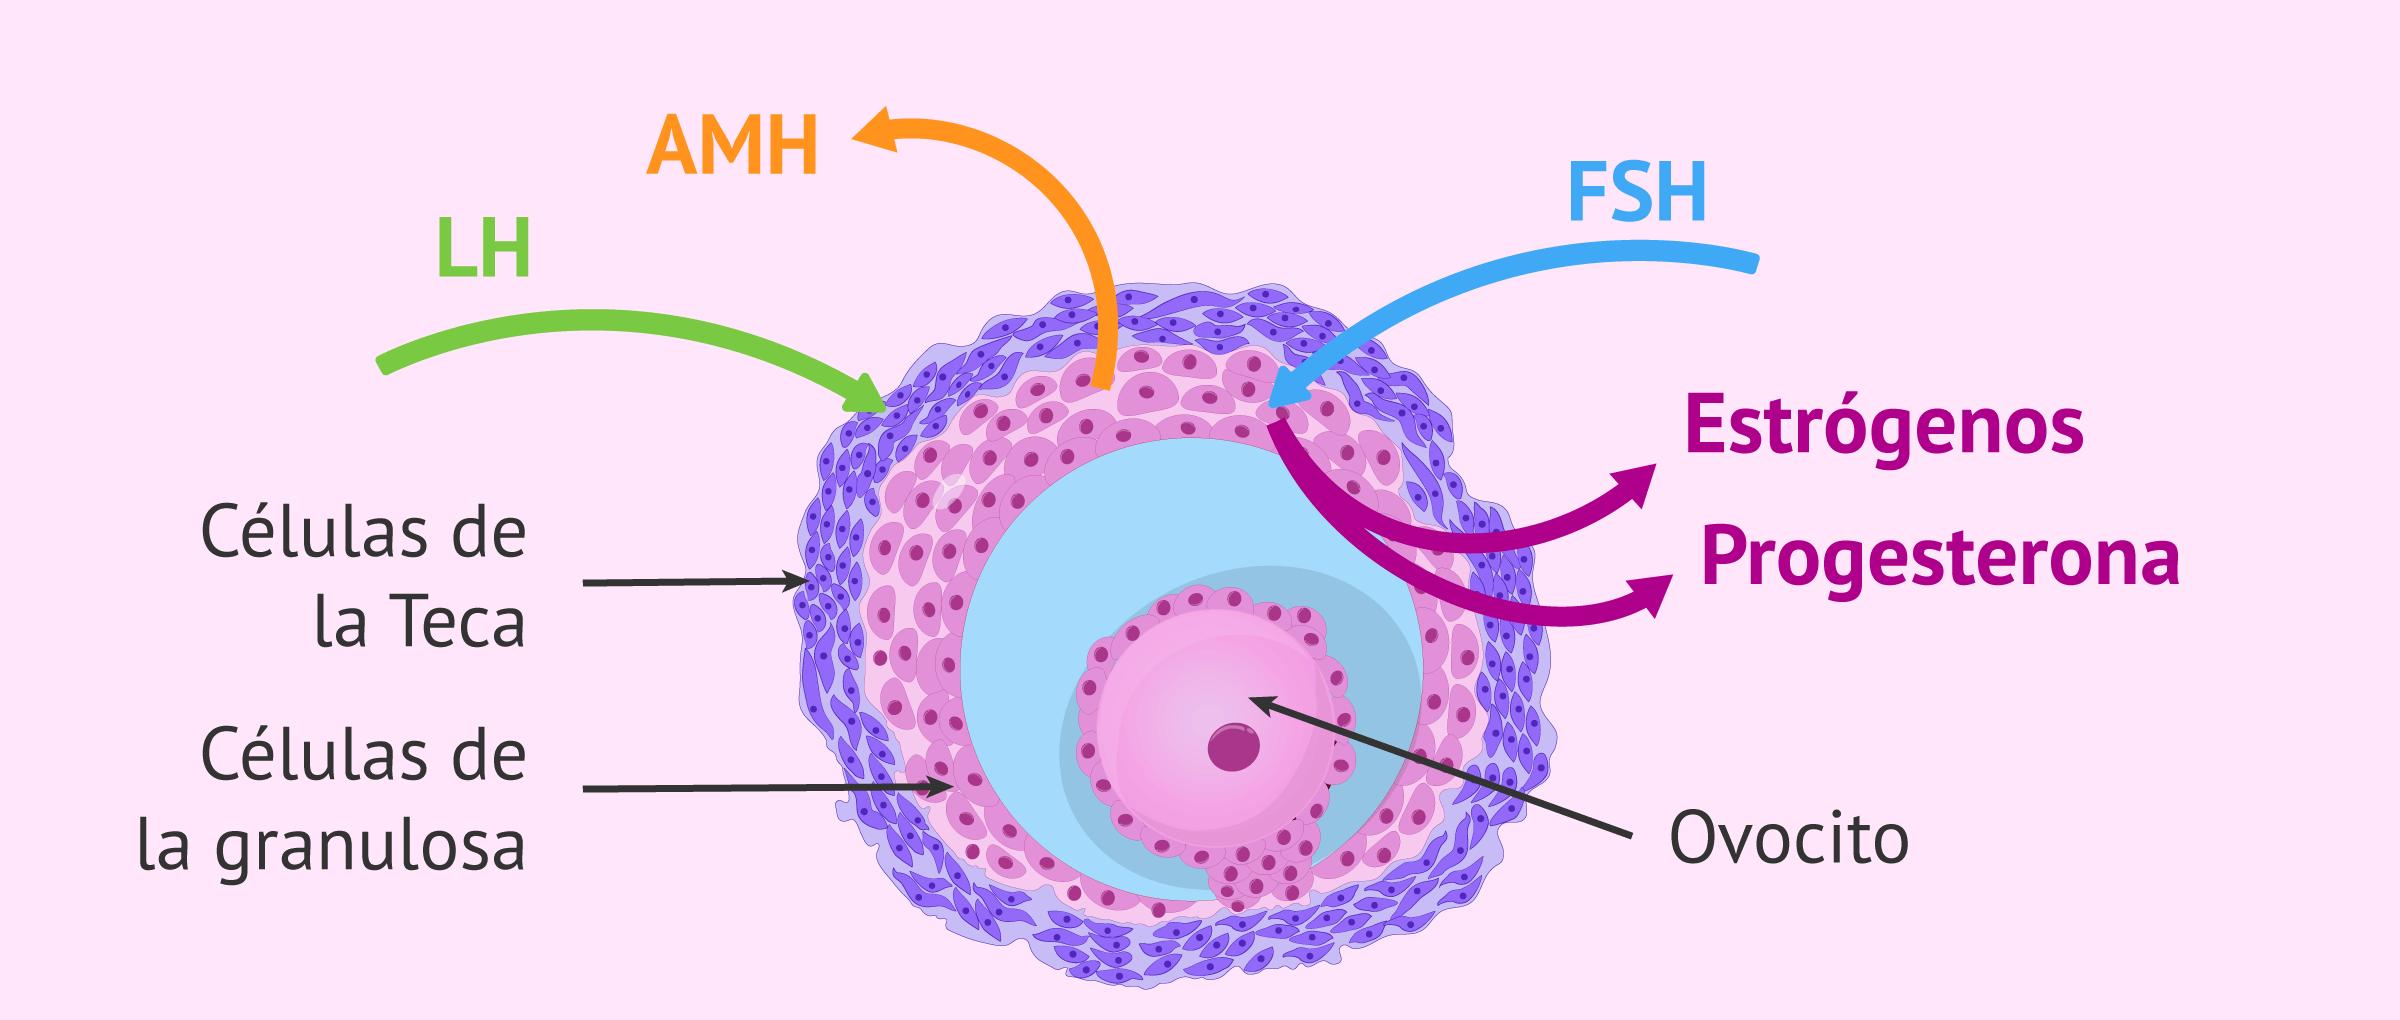 Hormonas secretadas por el ovario